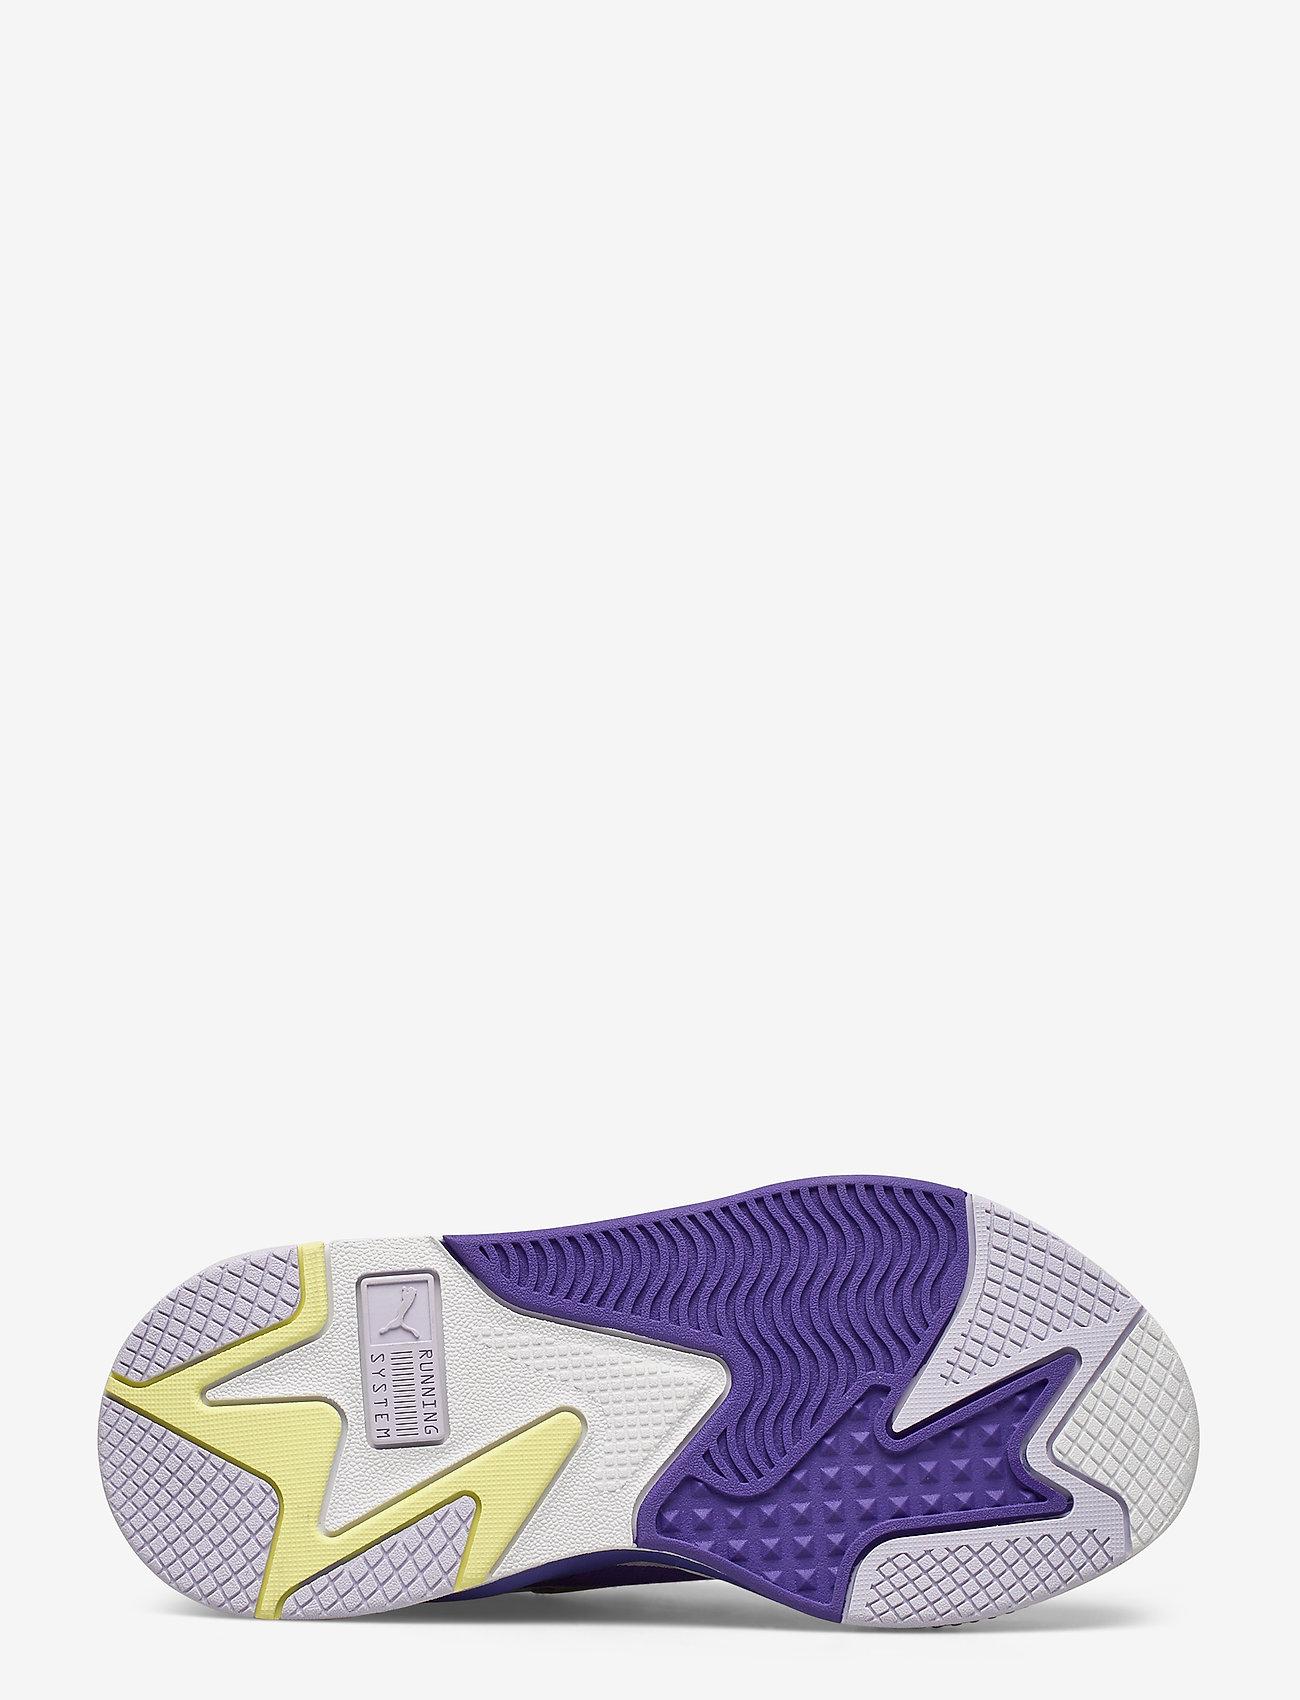 Rs-x Mesh Pop Wn's (Puma White-purple Corallites) - PUMA